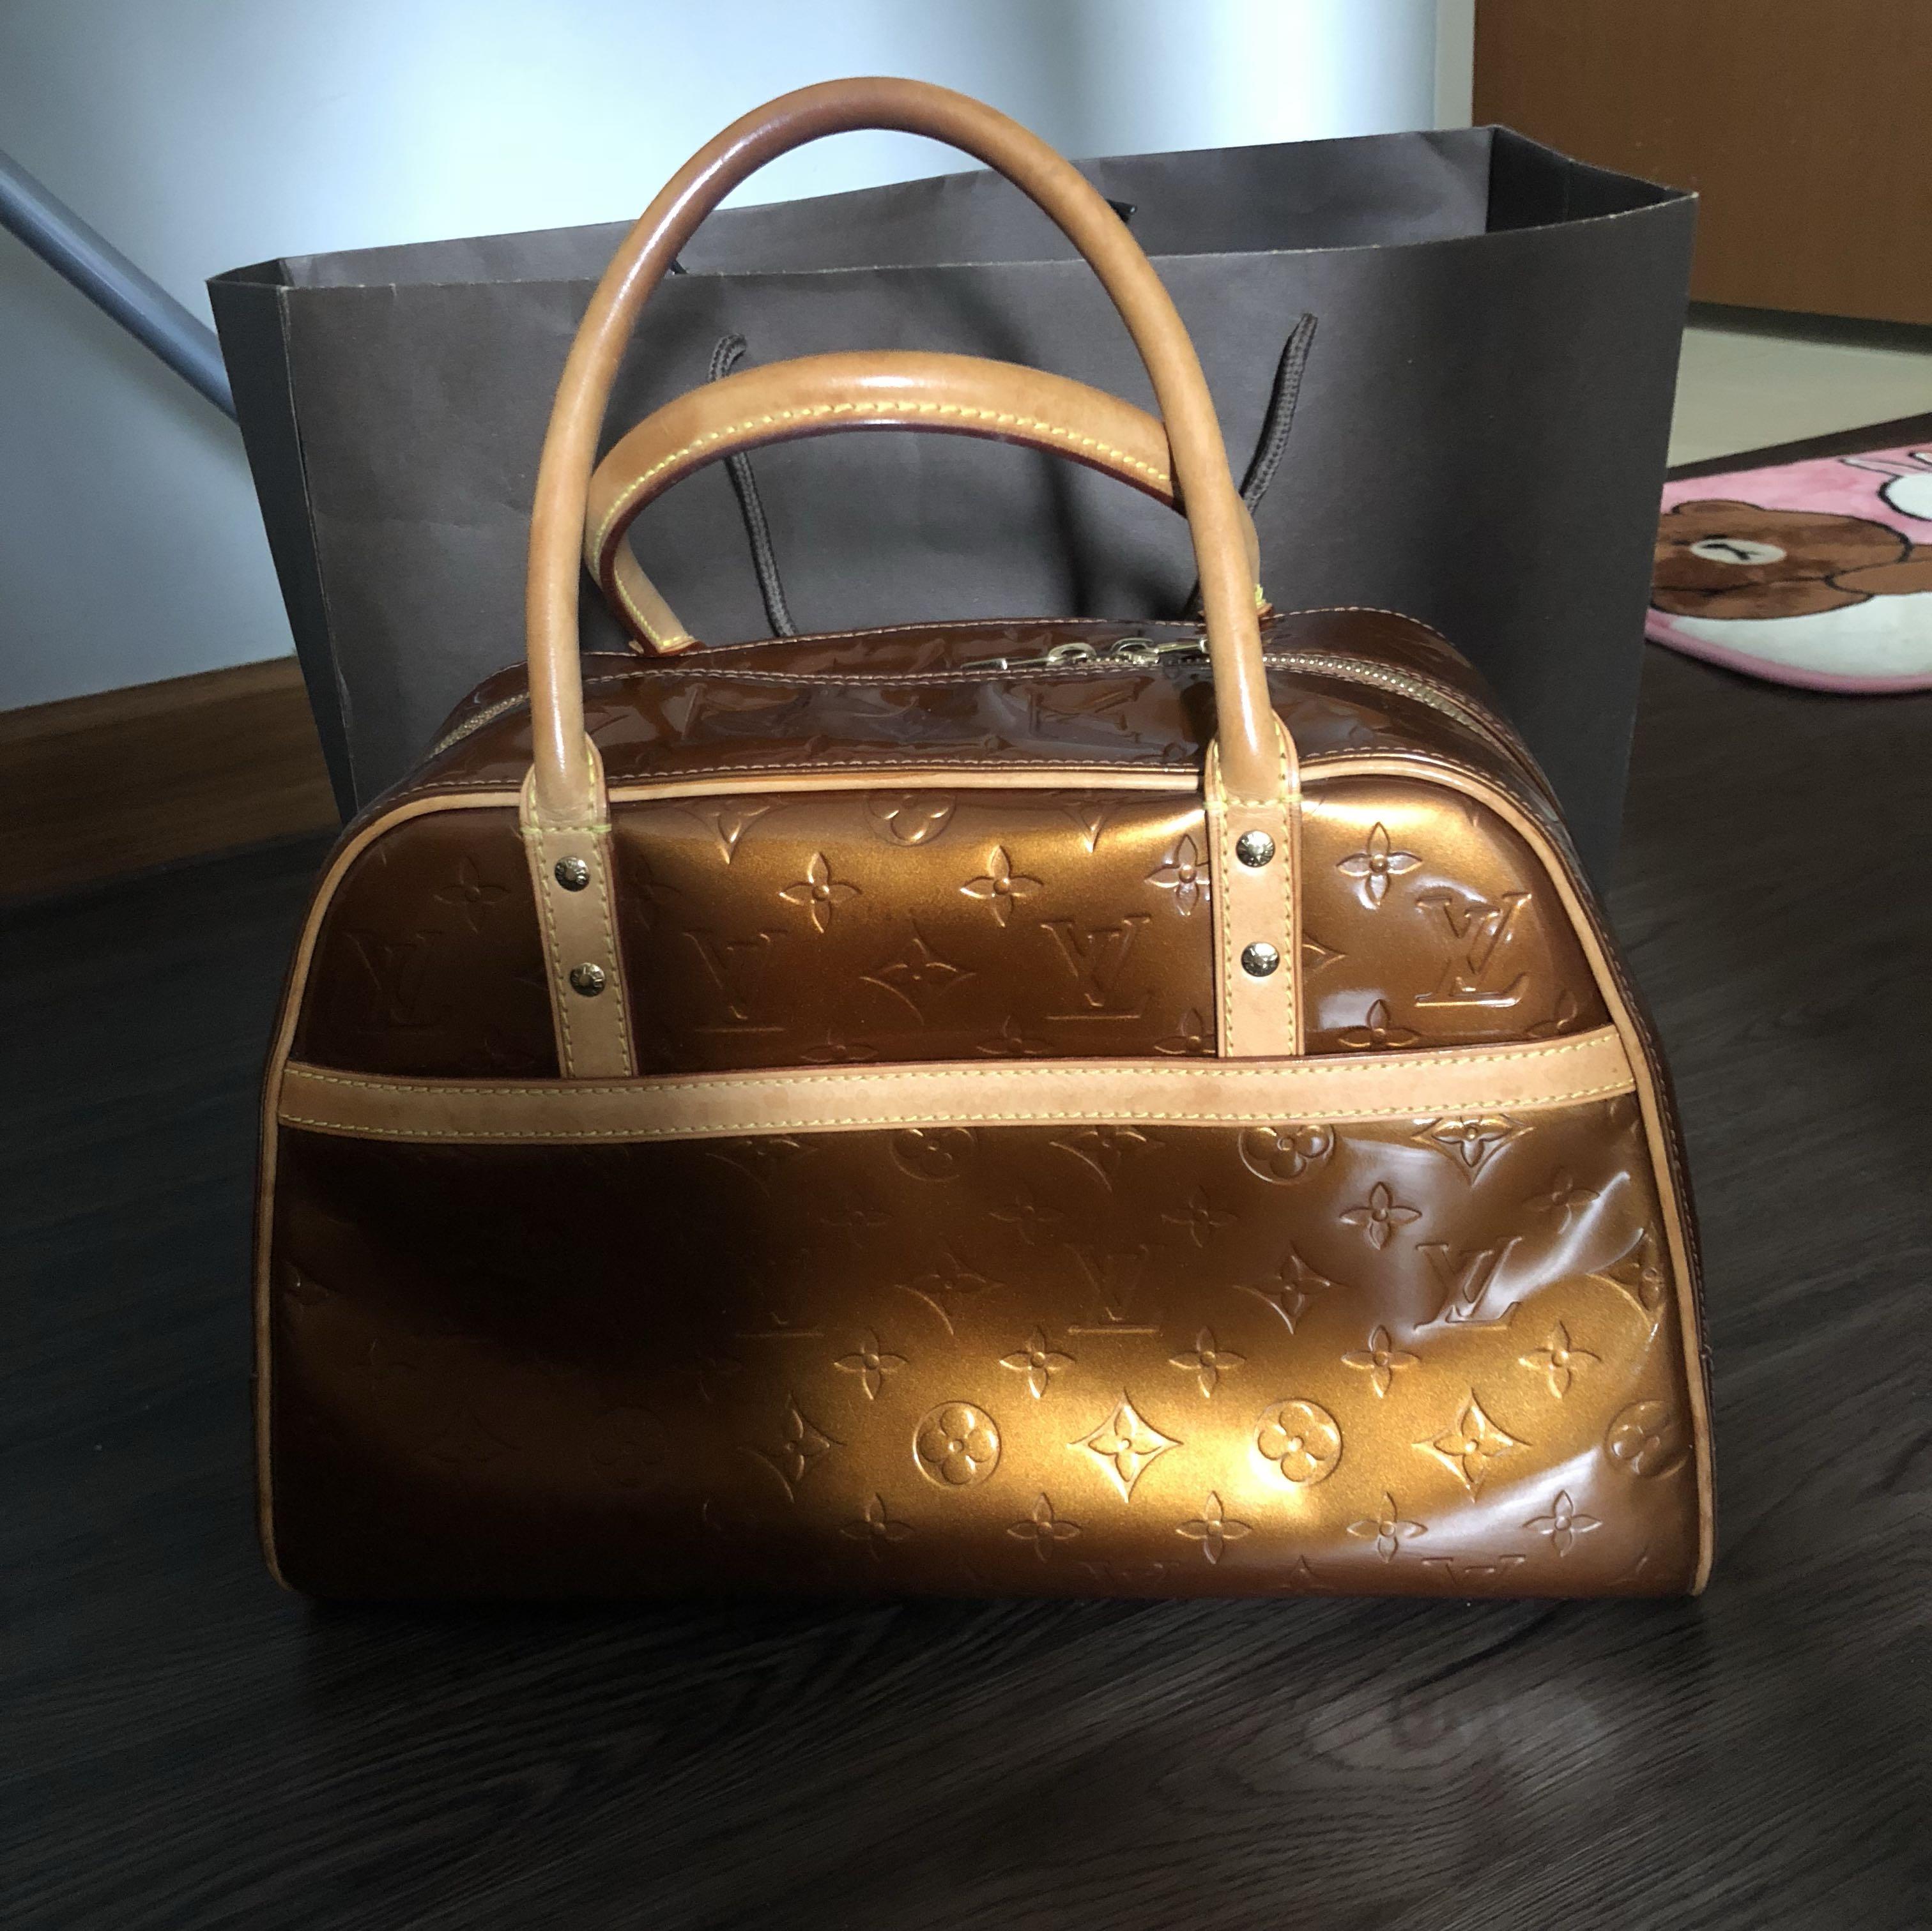 Preloved Louis Vuitton LV Bag in bronze d36e235faffad